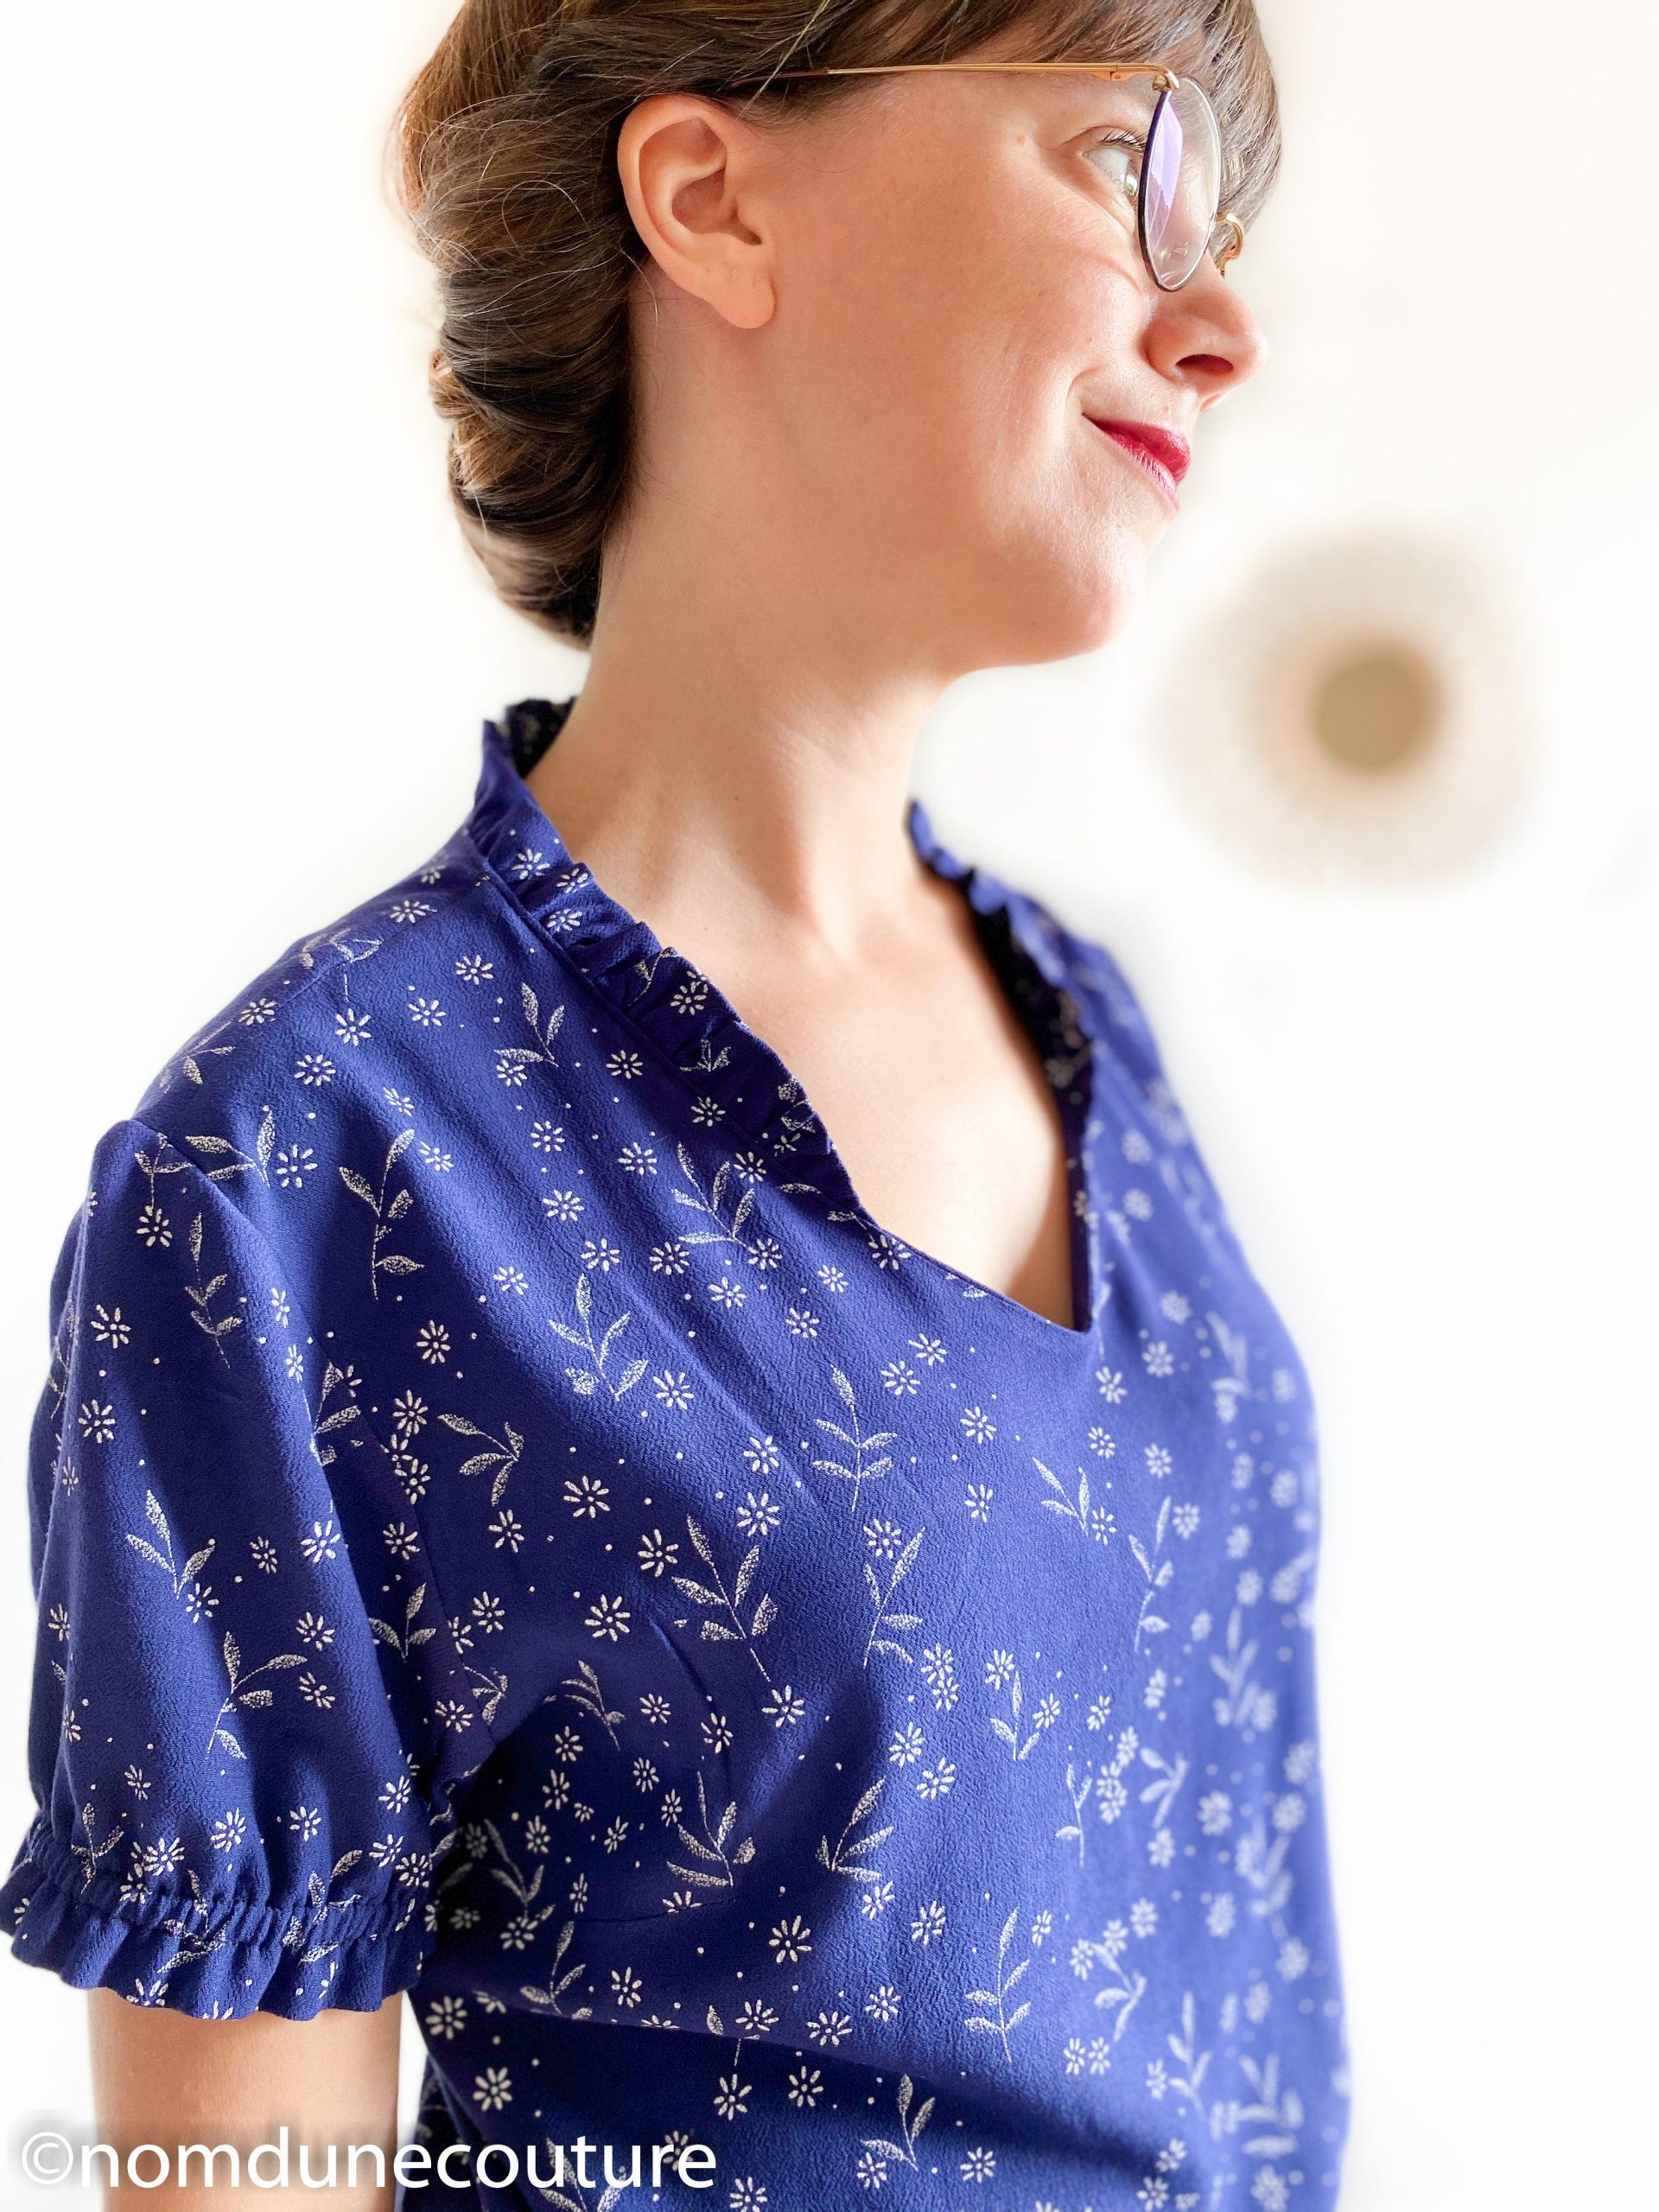 encolure robe divine dress your body